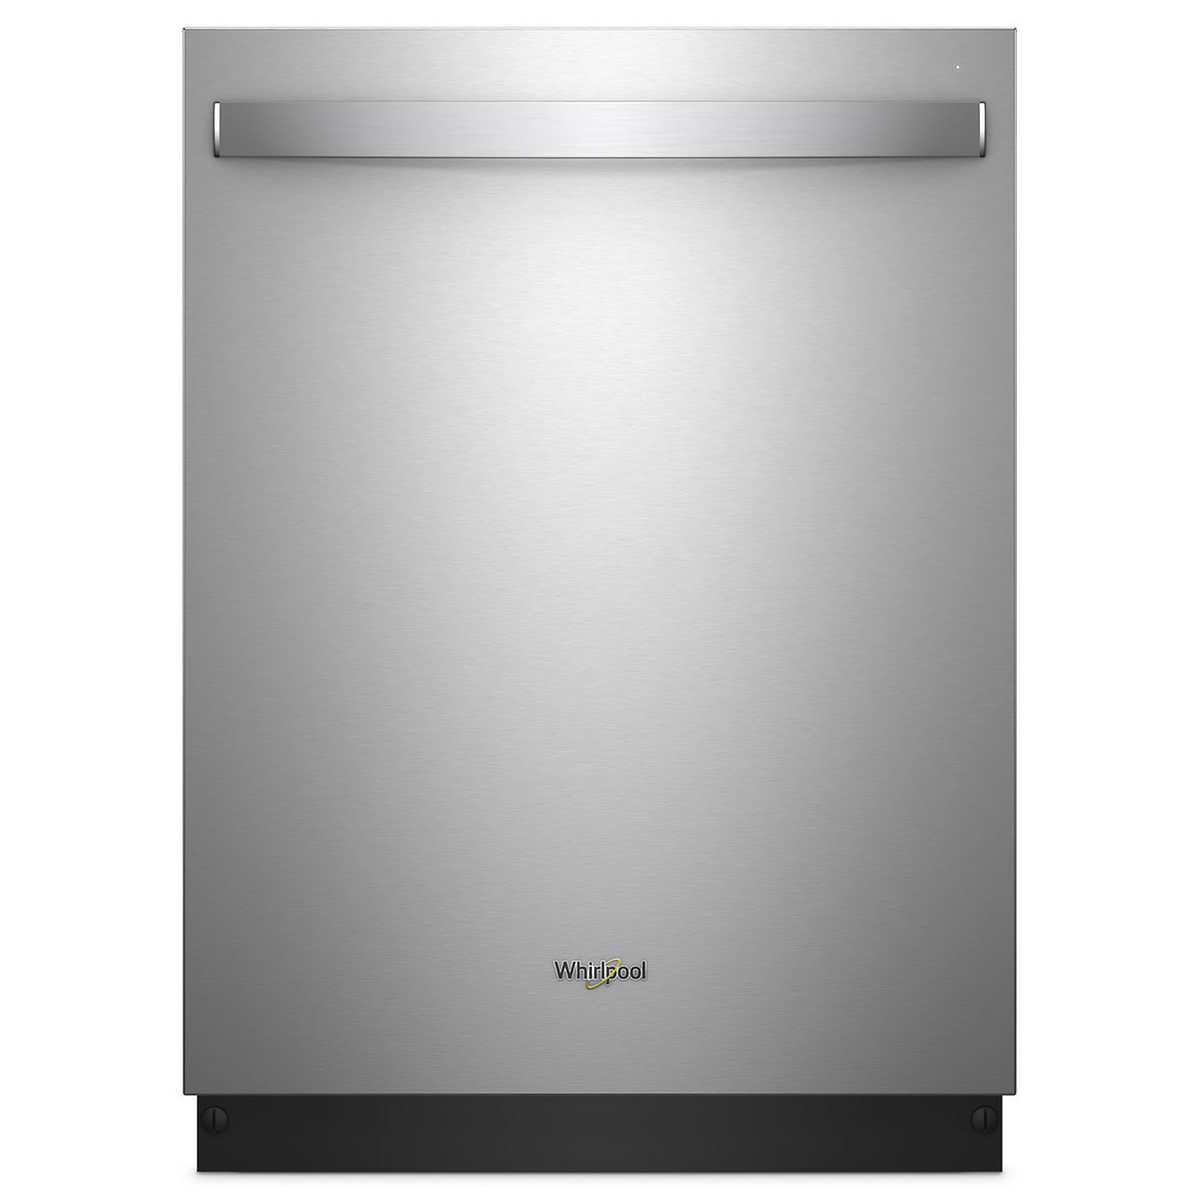 Costco Members: Whirlpool Stainless Steel Dishwasher WDT730PAHZ w ...